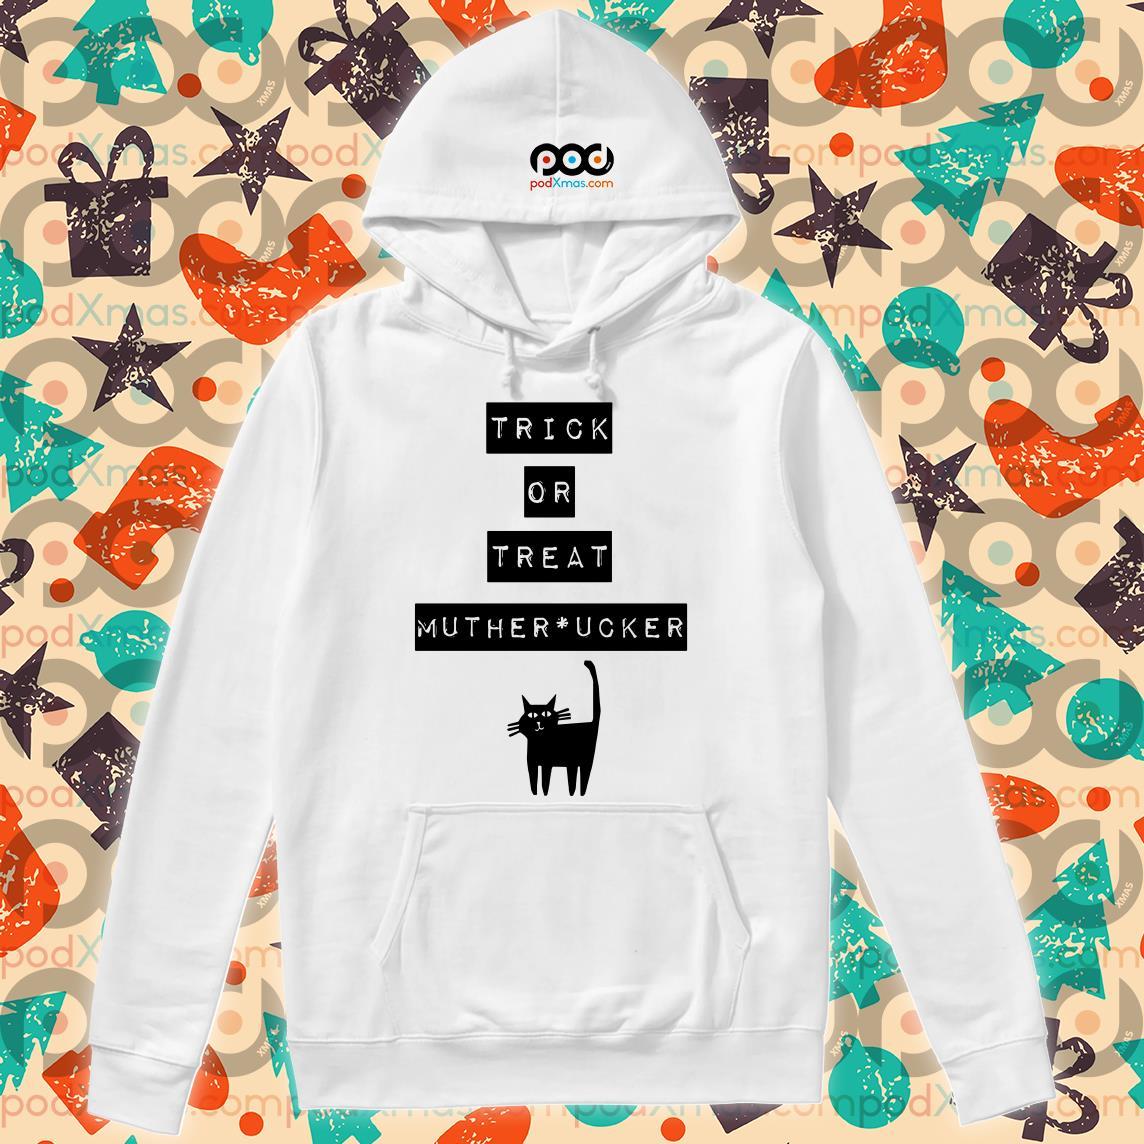 4 Sweatshirt Fashion Hoodie,Unsix Autumn Long Sleeve Cat Sweatshirt Pullover Tops Blouse Fathers Day/_